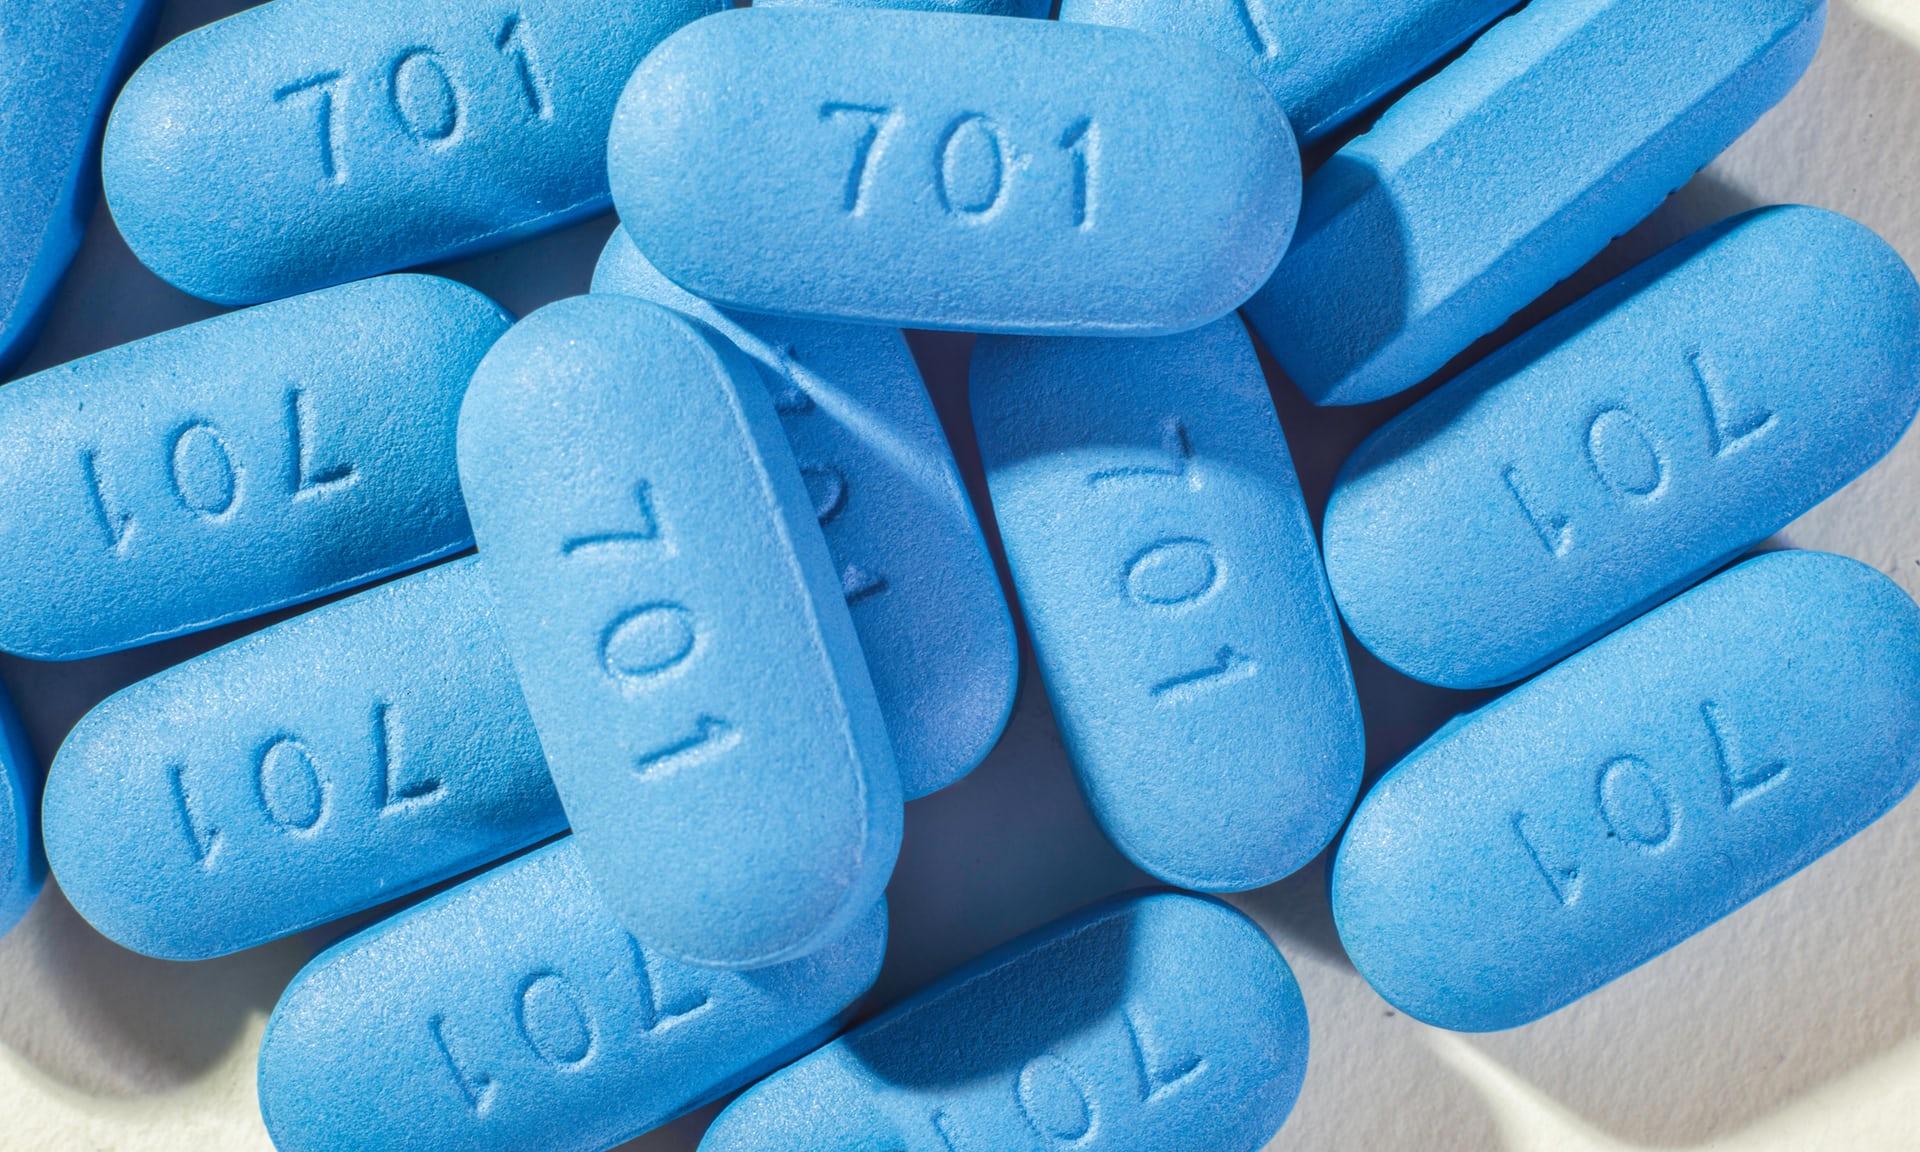 Таблетки Трувада (Truvada), препарата, достоверно снижающего риск заражения ВИЧ-инфекцией.